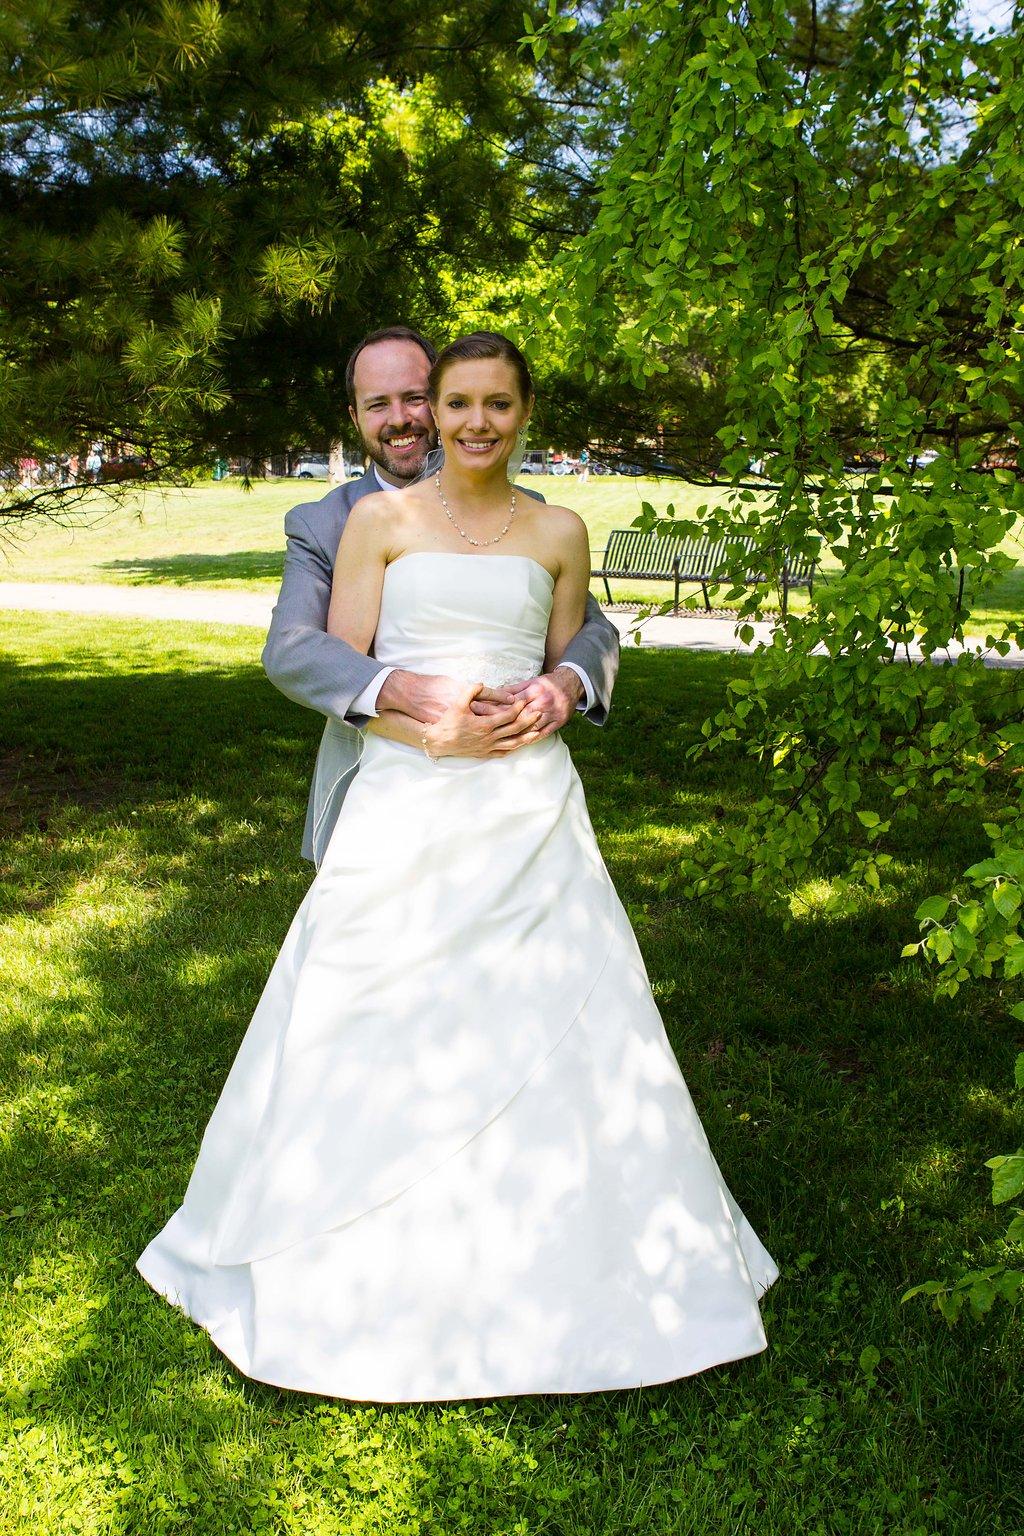 jakeandsuze_weddingselects-17.jpg